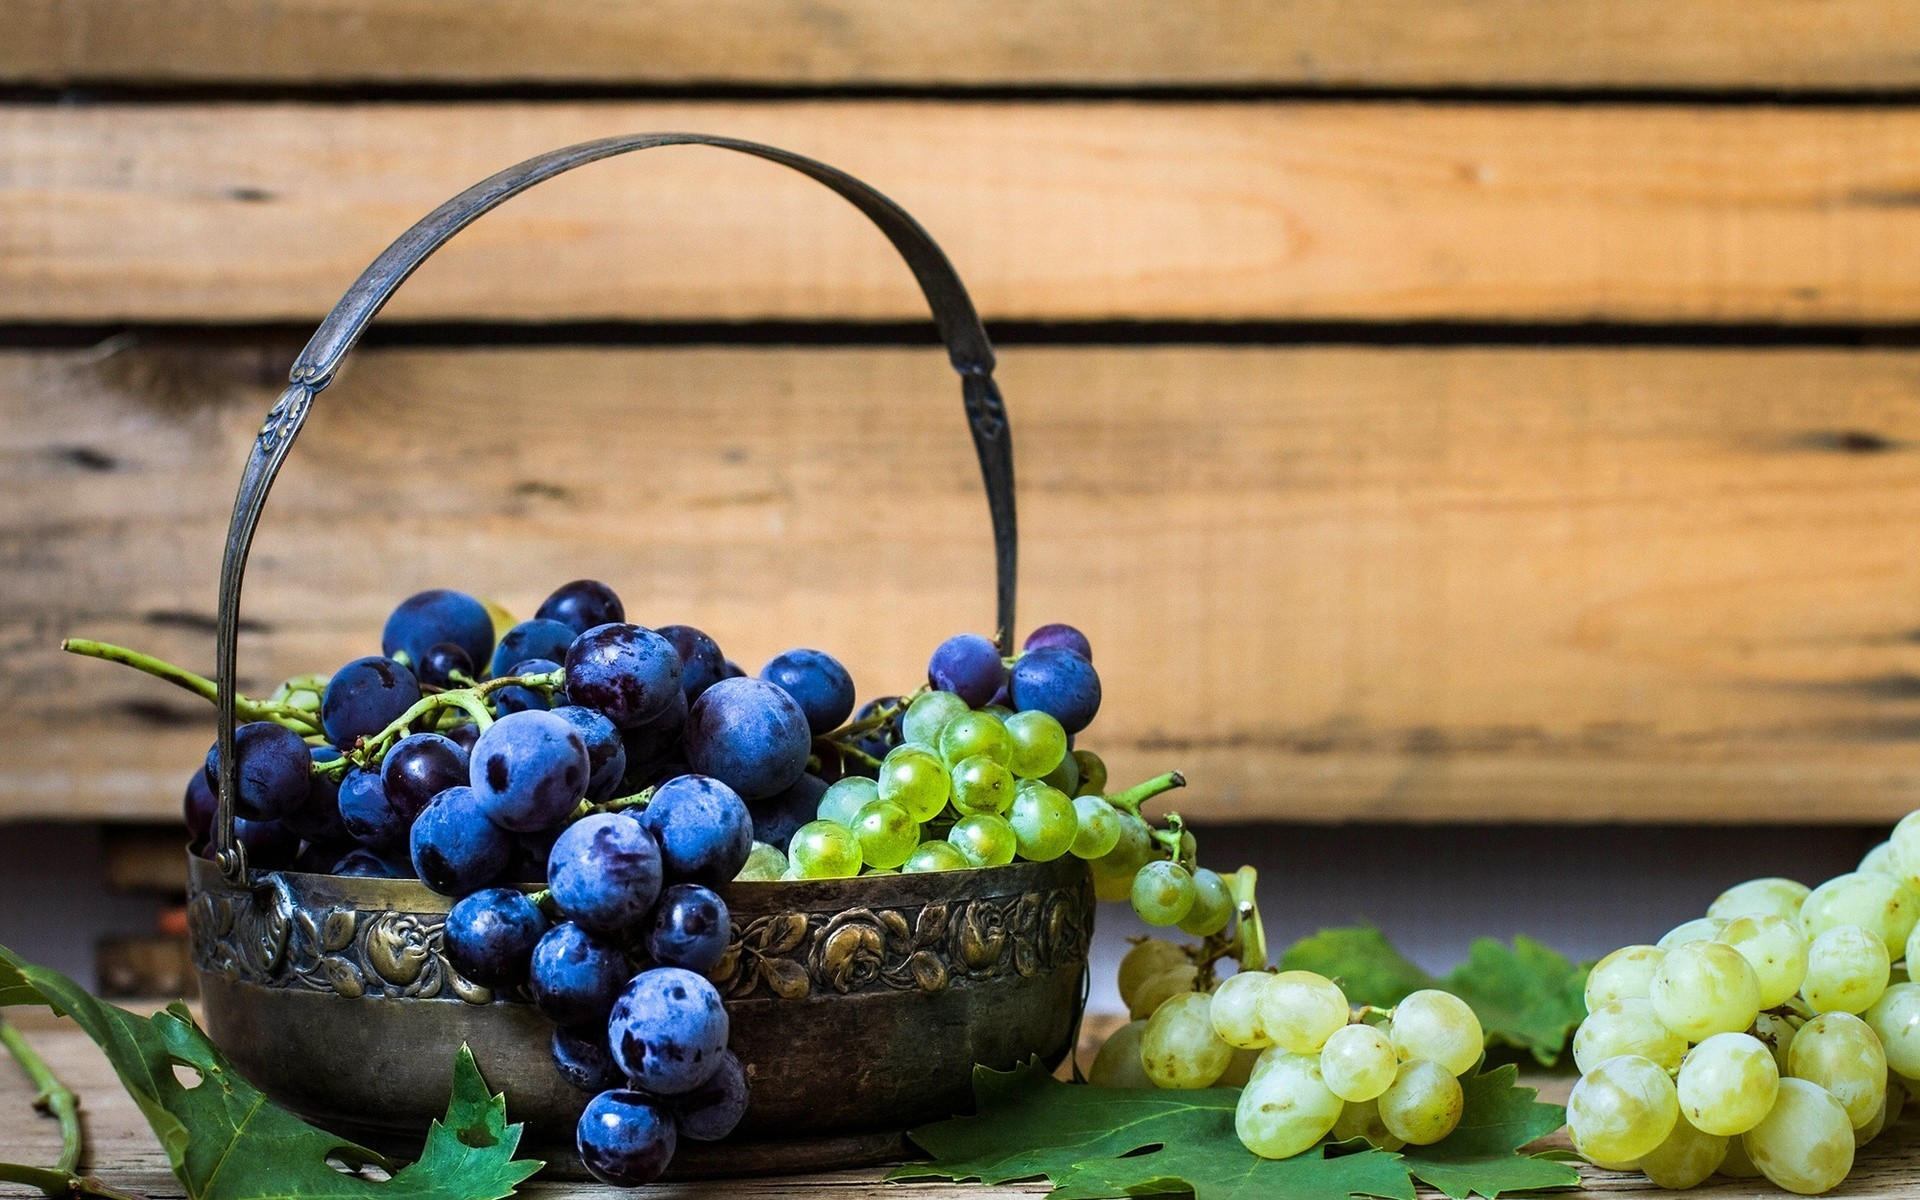 картинки ягод винограда